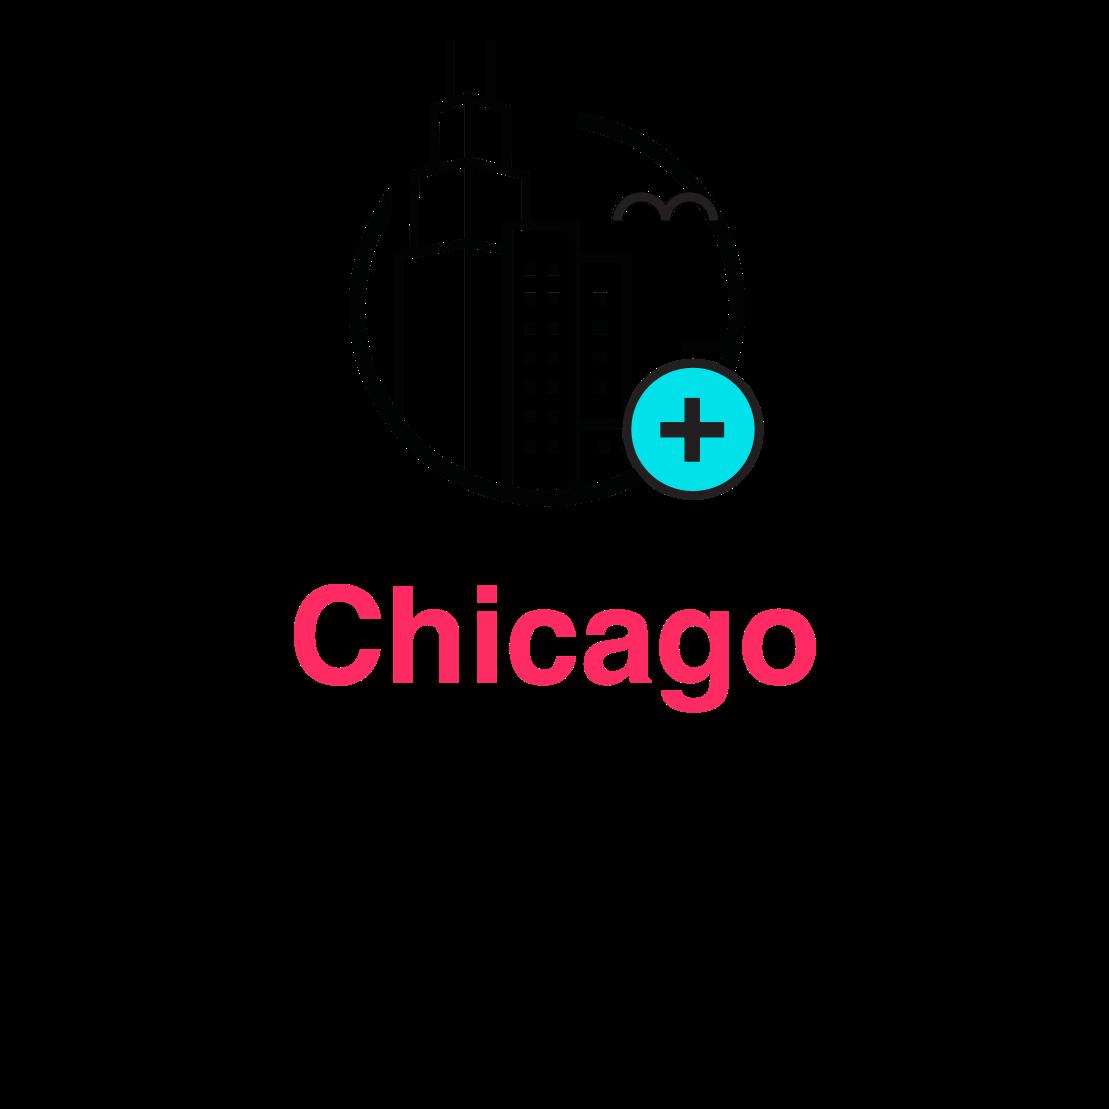 Chicago1-1109